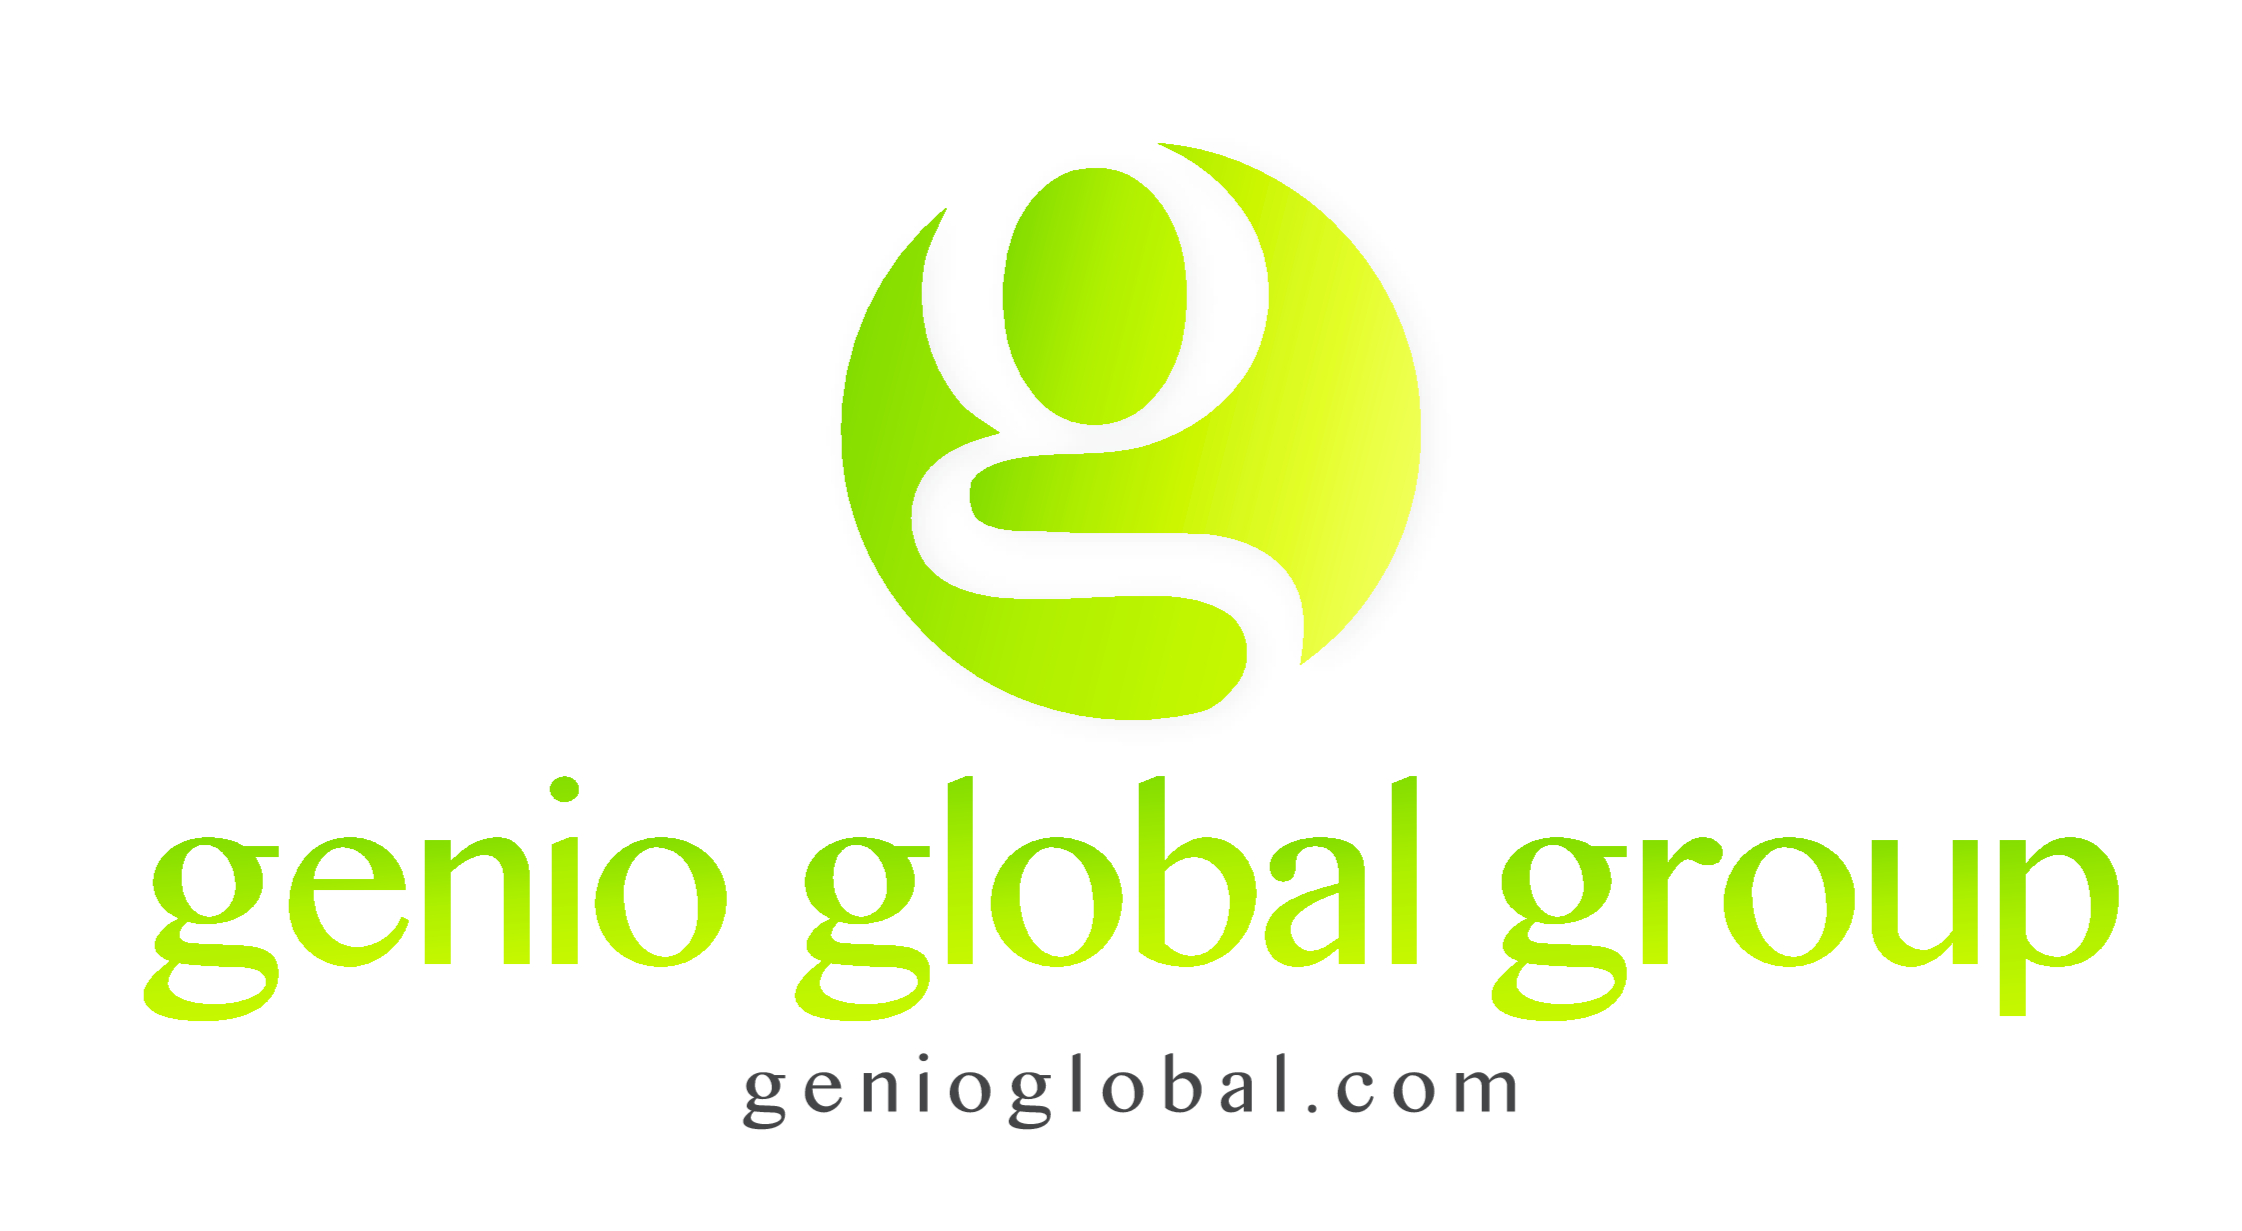 genio global group